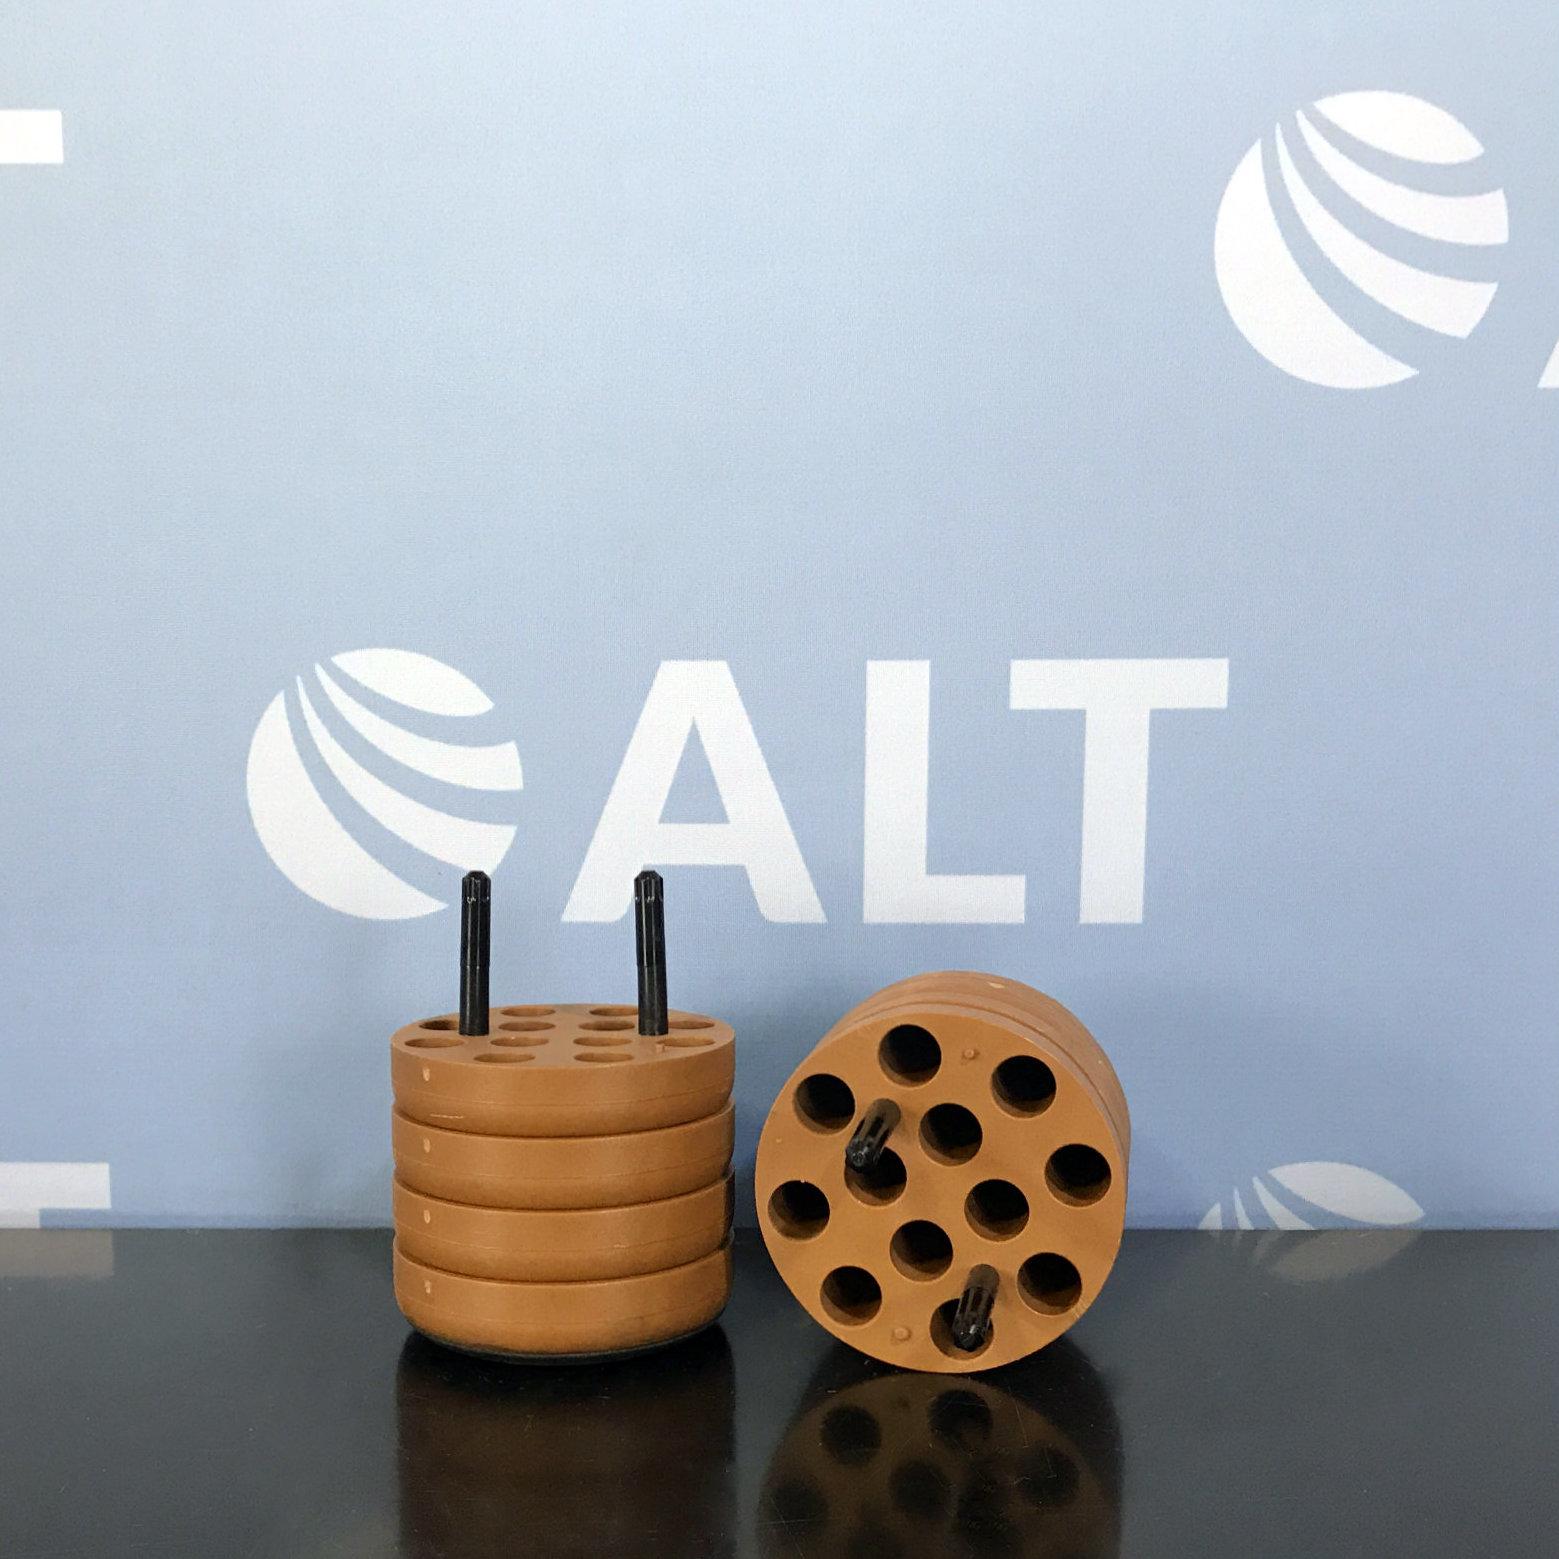 12 x 15 mL Tube Slot Bucket Adapter Insert P/N 54270 (Set of 2) Name